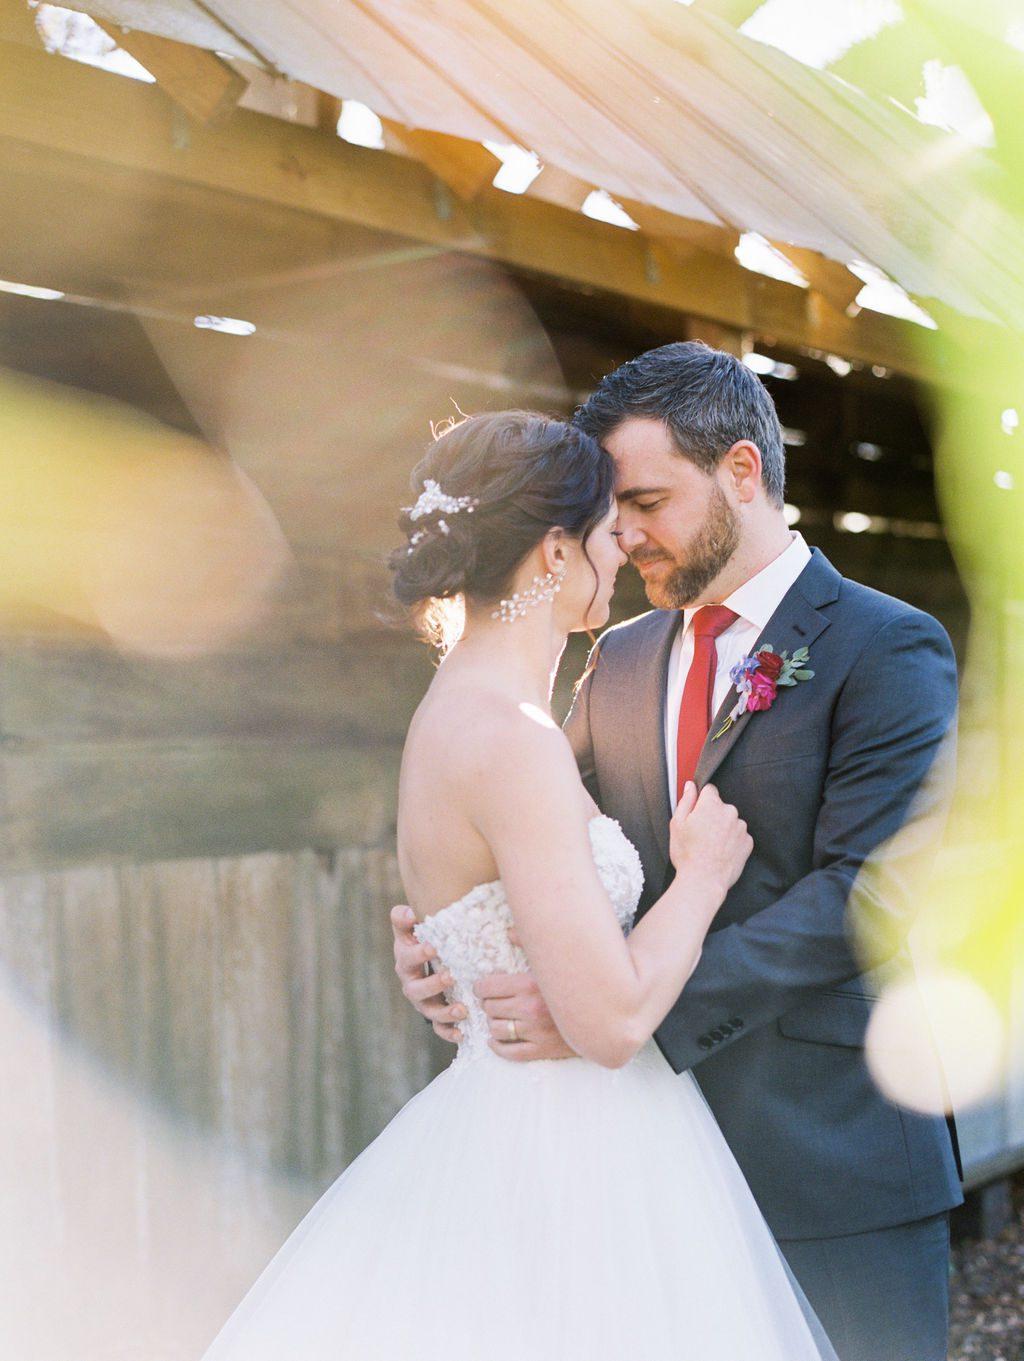 Alison + Dane's Whimsical & Enchanting Wedding